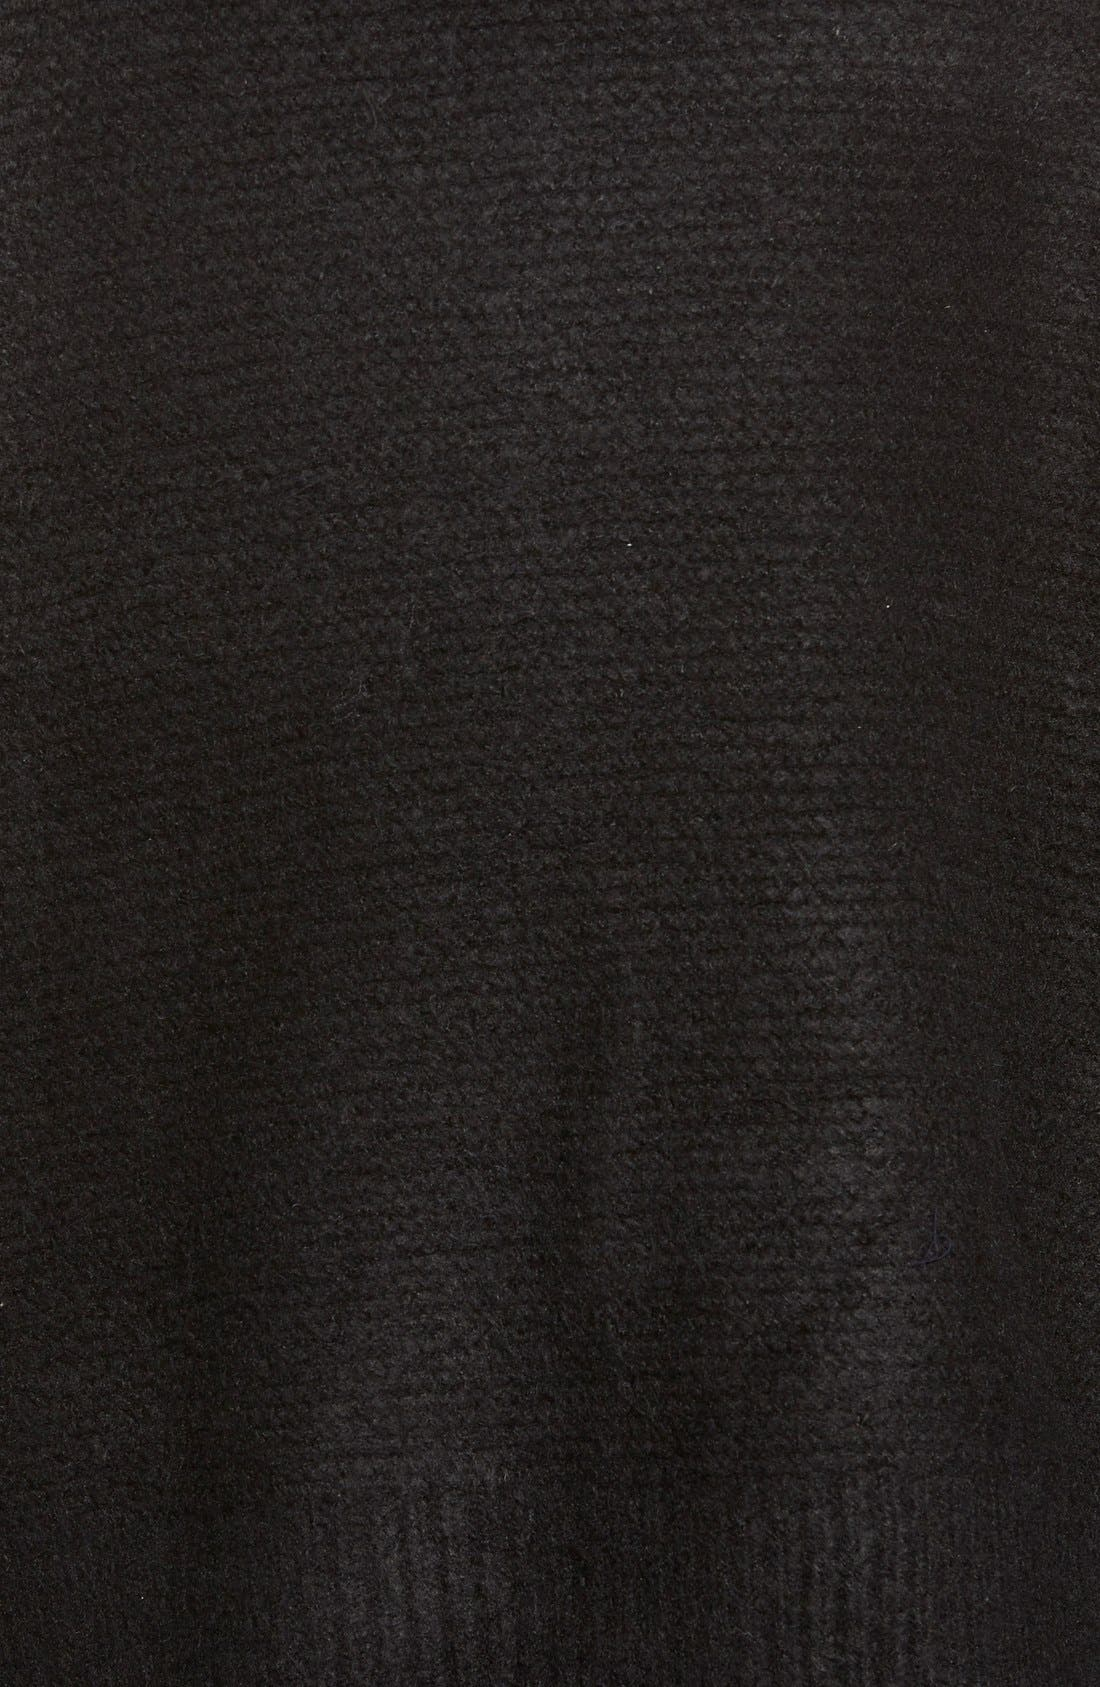 Boxy Turtleneck Sweater,                             Alternate thumbnail 4, color,                             001